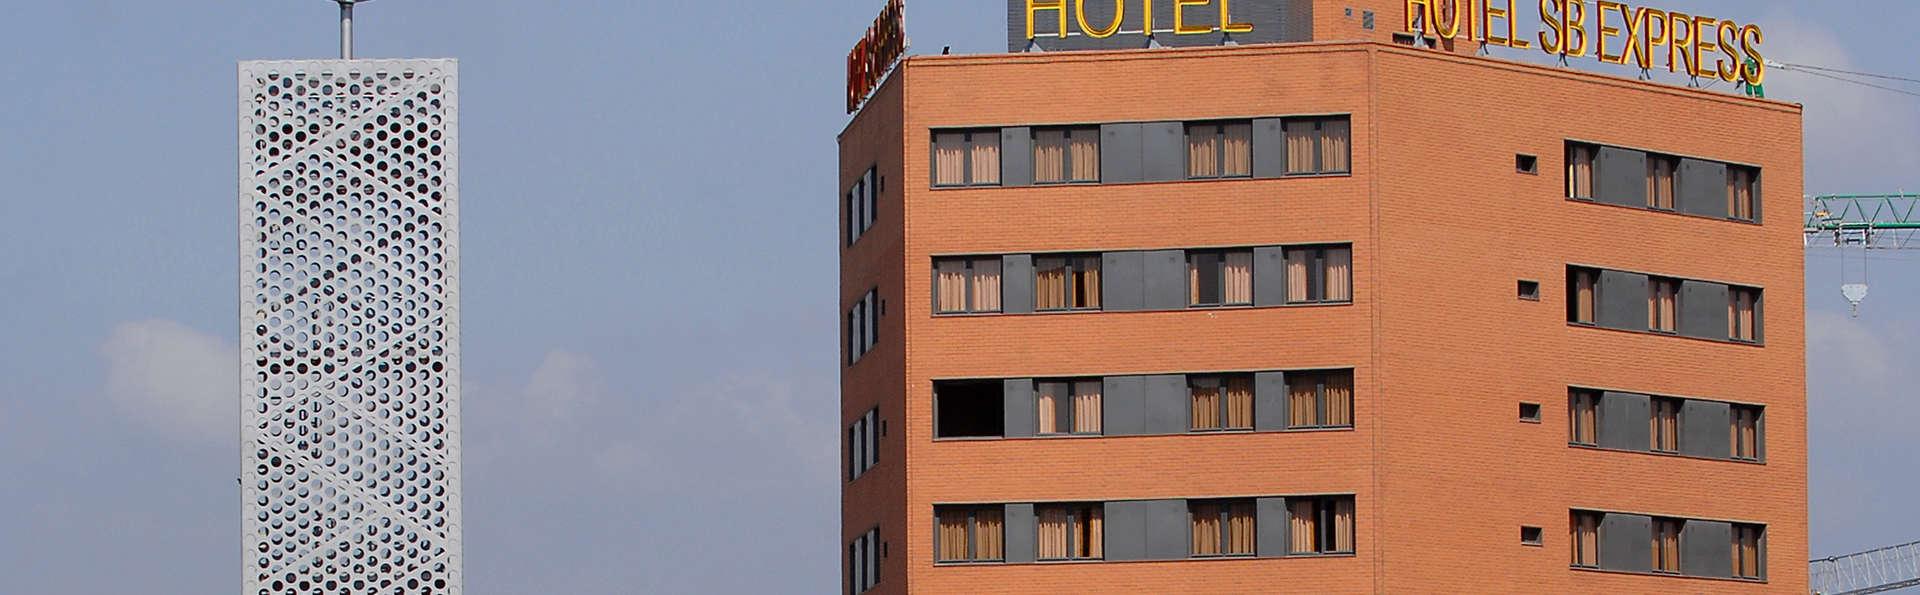 Hotel SB Express Tarragona - EDIT_front.jpg